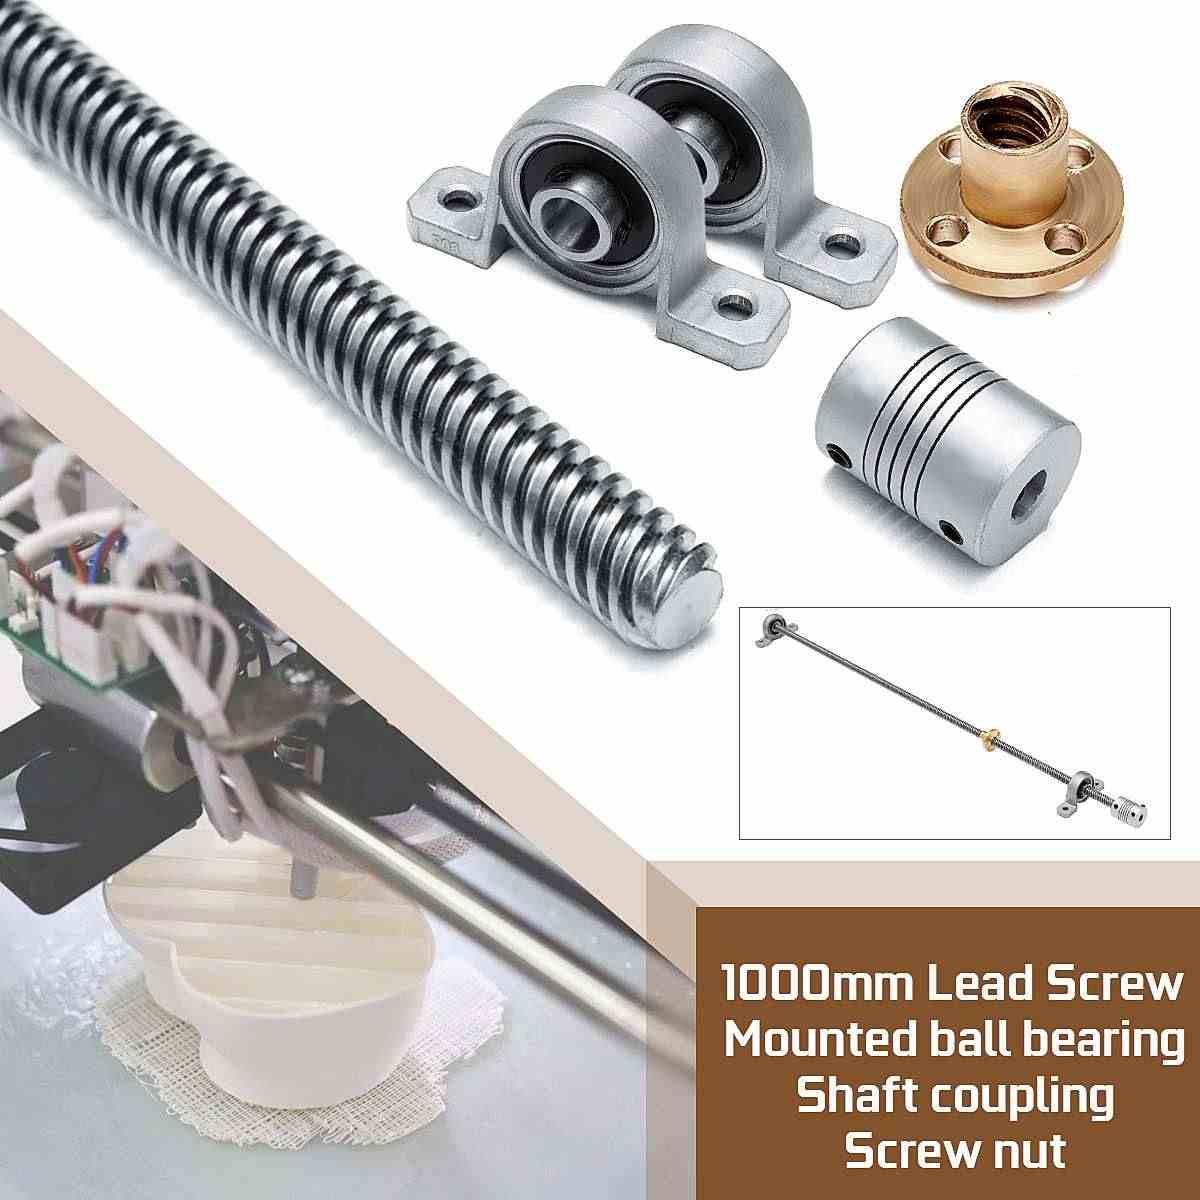 Typ-3, 1Set, 1000mm CopperNut+Coupling Shaft+Horizontal Bearing S SIENOC 1000mm 3D Printer 8mm Bearing Steel T8 Trapezoidal Lead Screw Rod Linear Bar